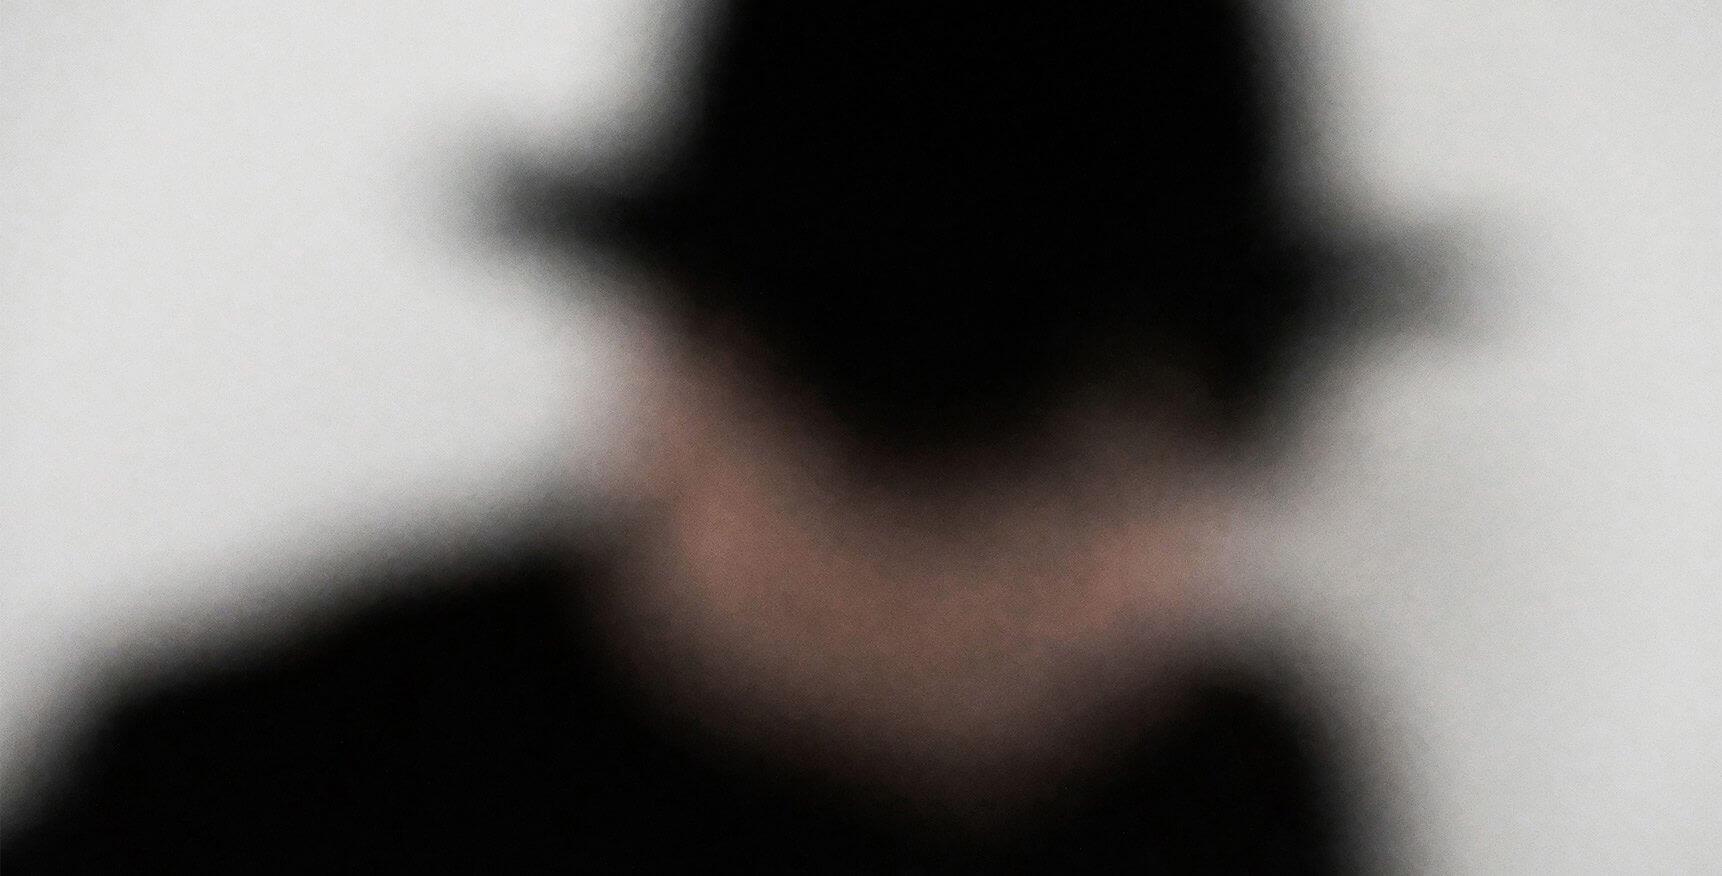 Cornelius收錄在專輯「Ripple Waves」的Studio Live版影片公開 Cornelius_、